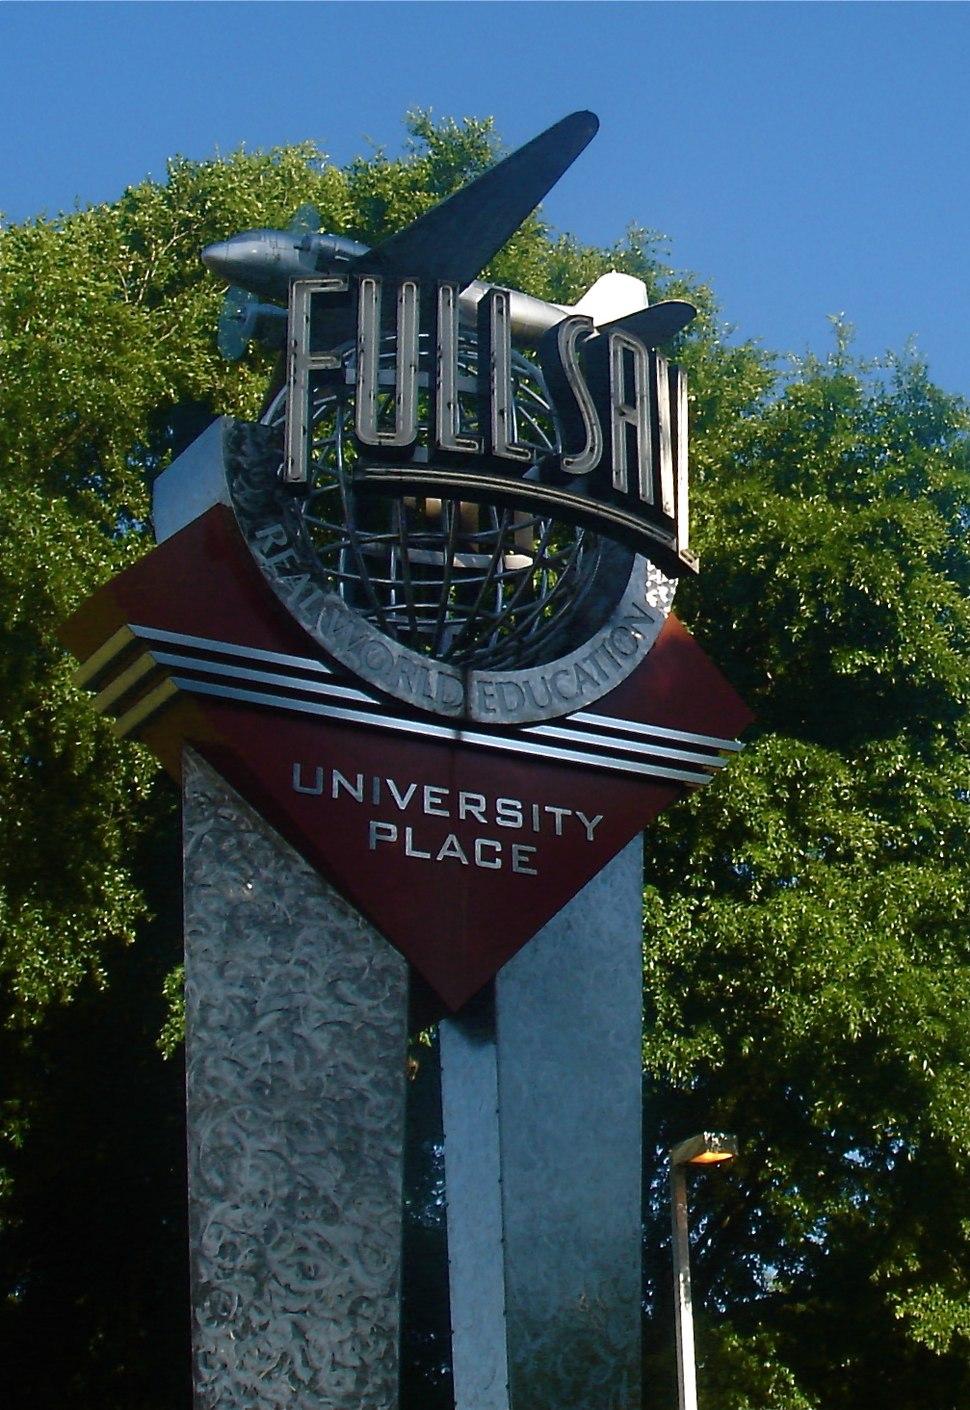 Full sail university sign